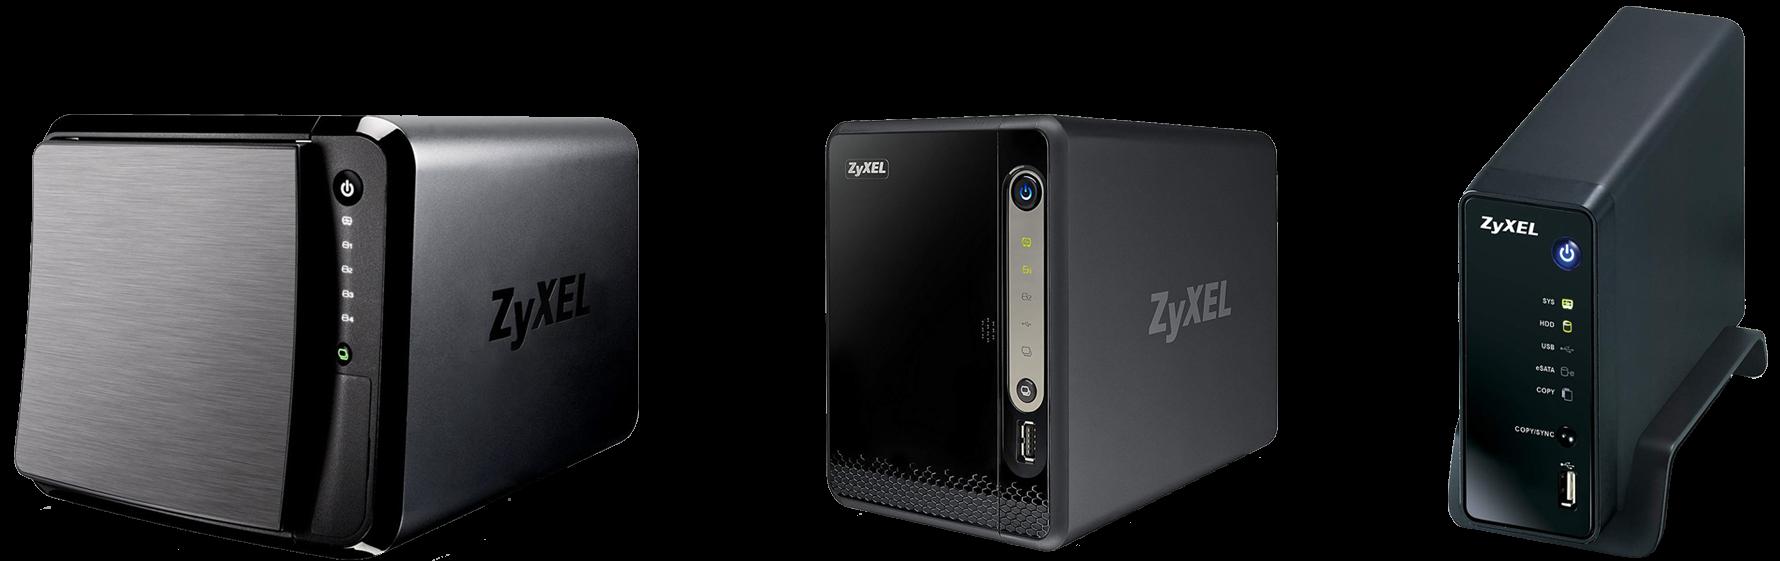 Zyxel Data Recovery Service